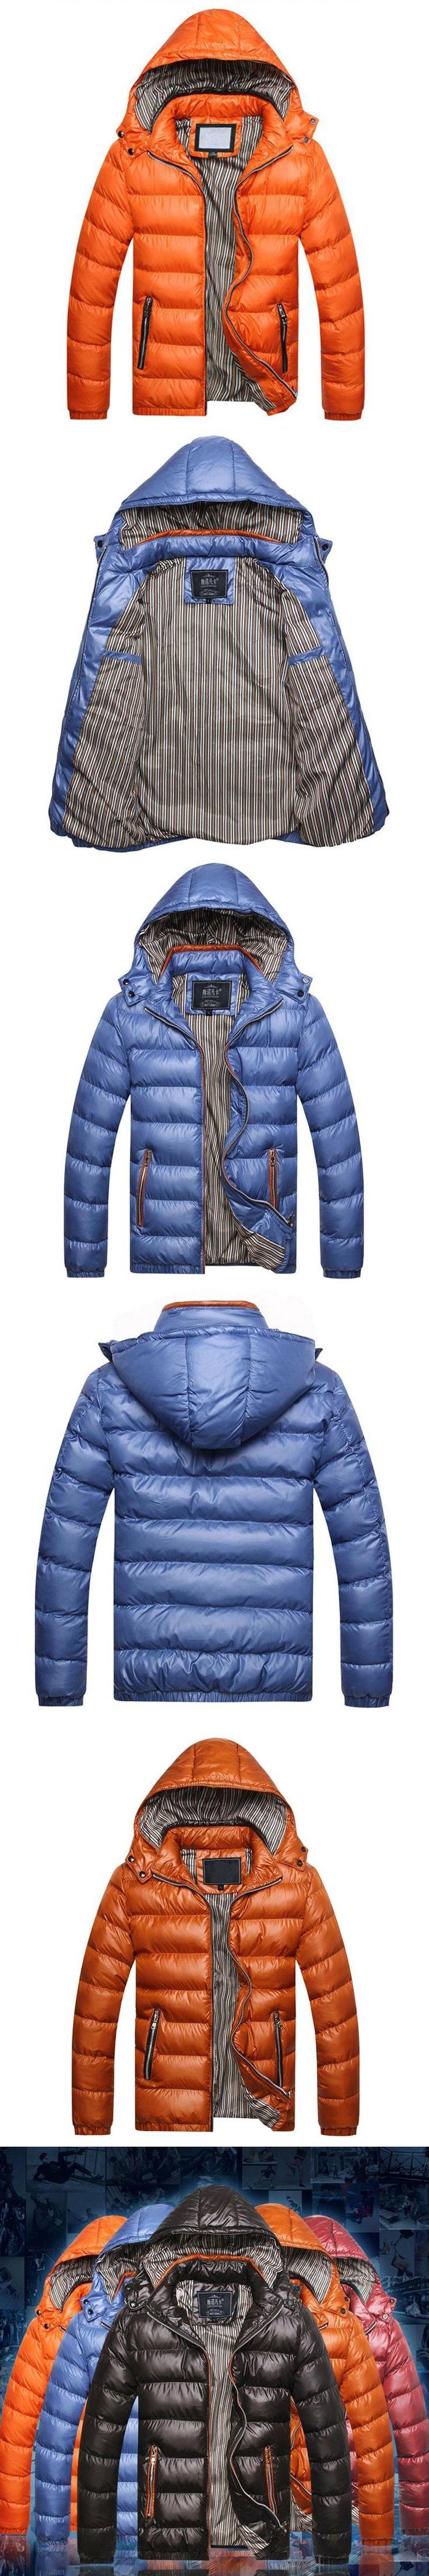 Winter Jacket Men Warm Outerwear Down Jackets winter Parka chaquetas plumas hombre for men coats and jackets Plus size XXXL